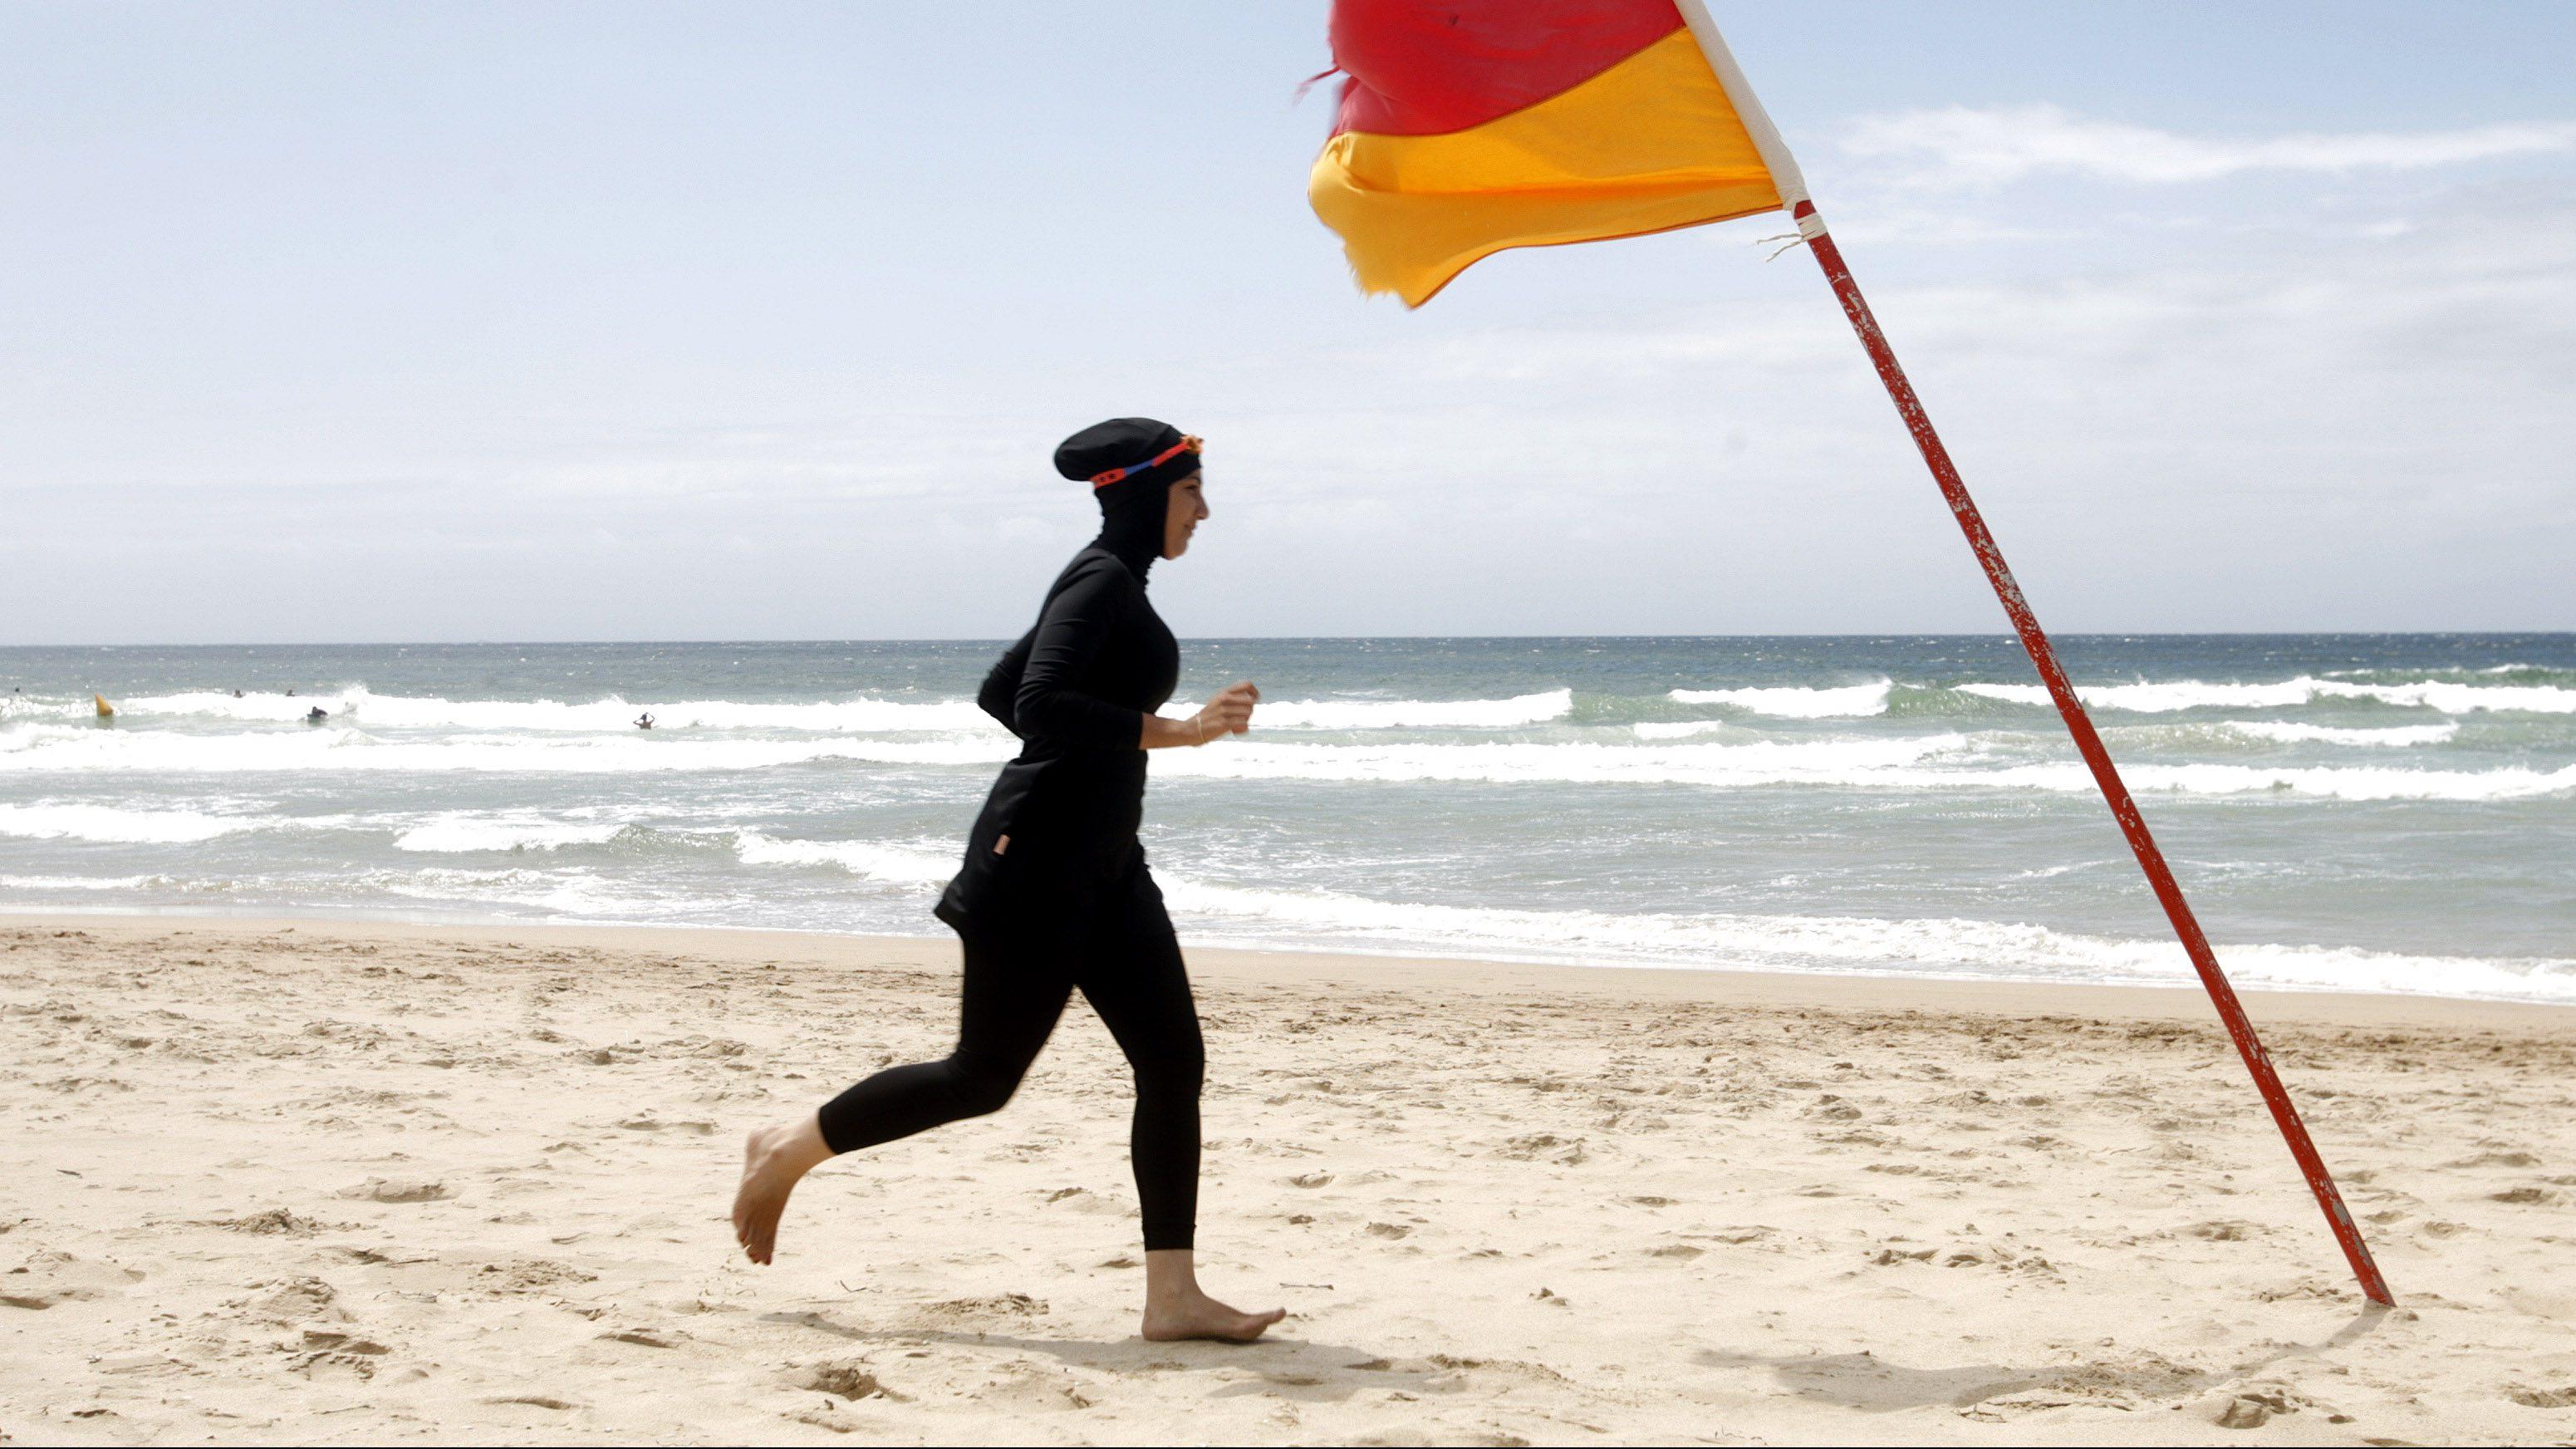 Trainee volunteer surf life saver Laalaa runs along North Cronulla Beach in Sydney